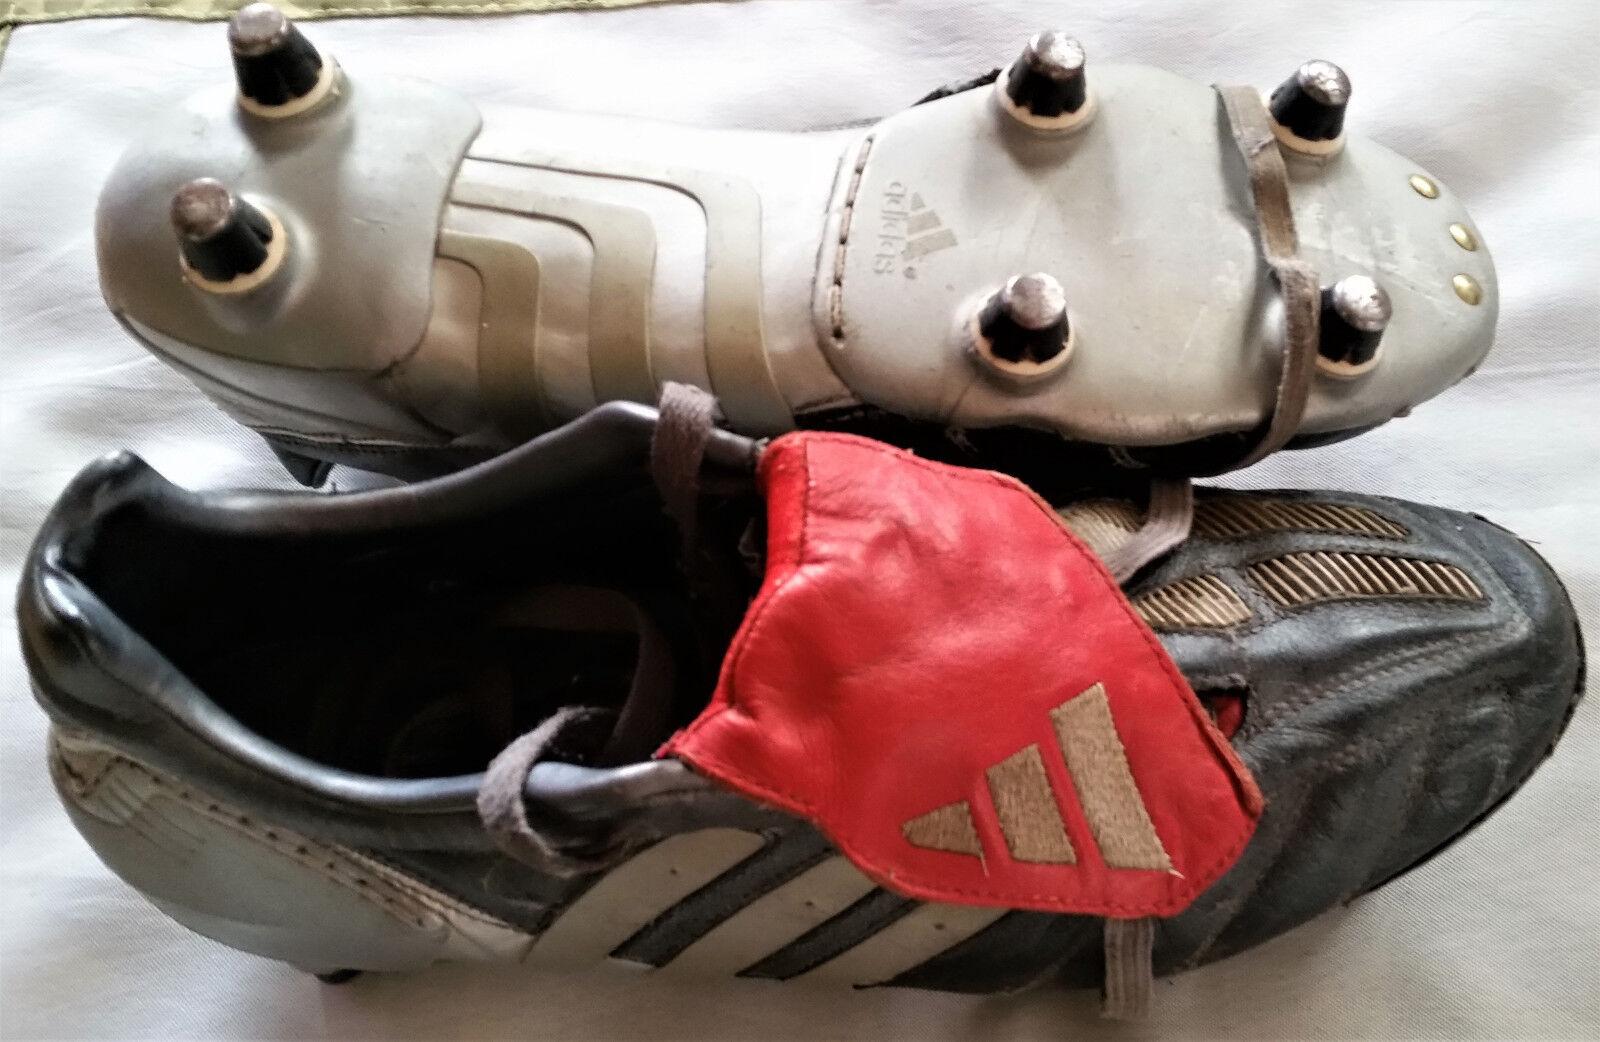 ADIDAS Prossoator mania Scarpe, scarpette da calcio, Tg. 42 23 , calcio